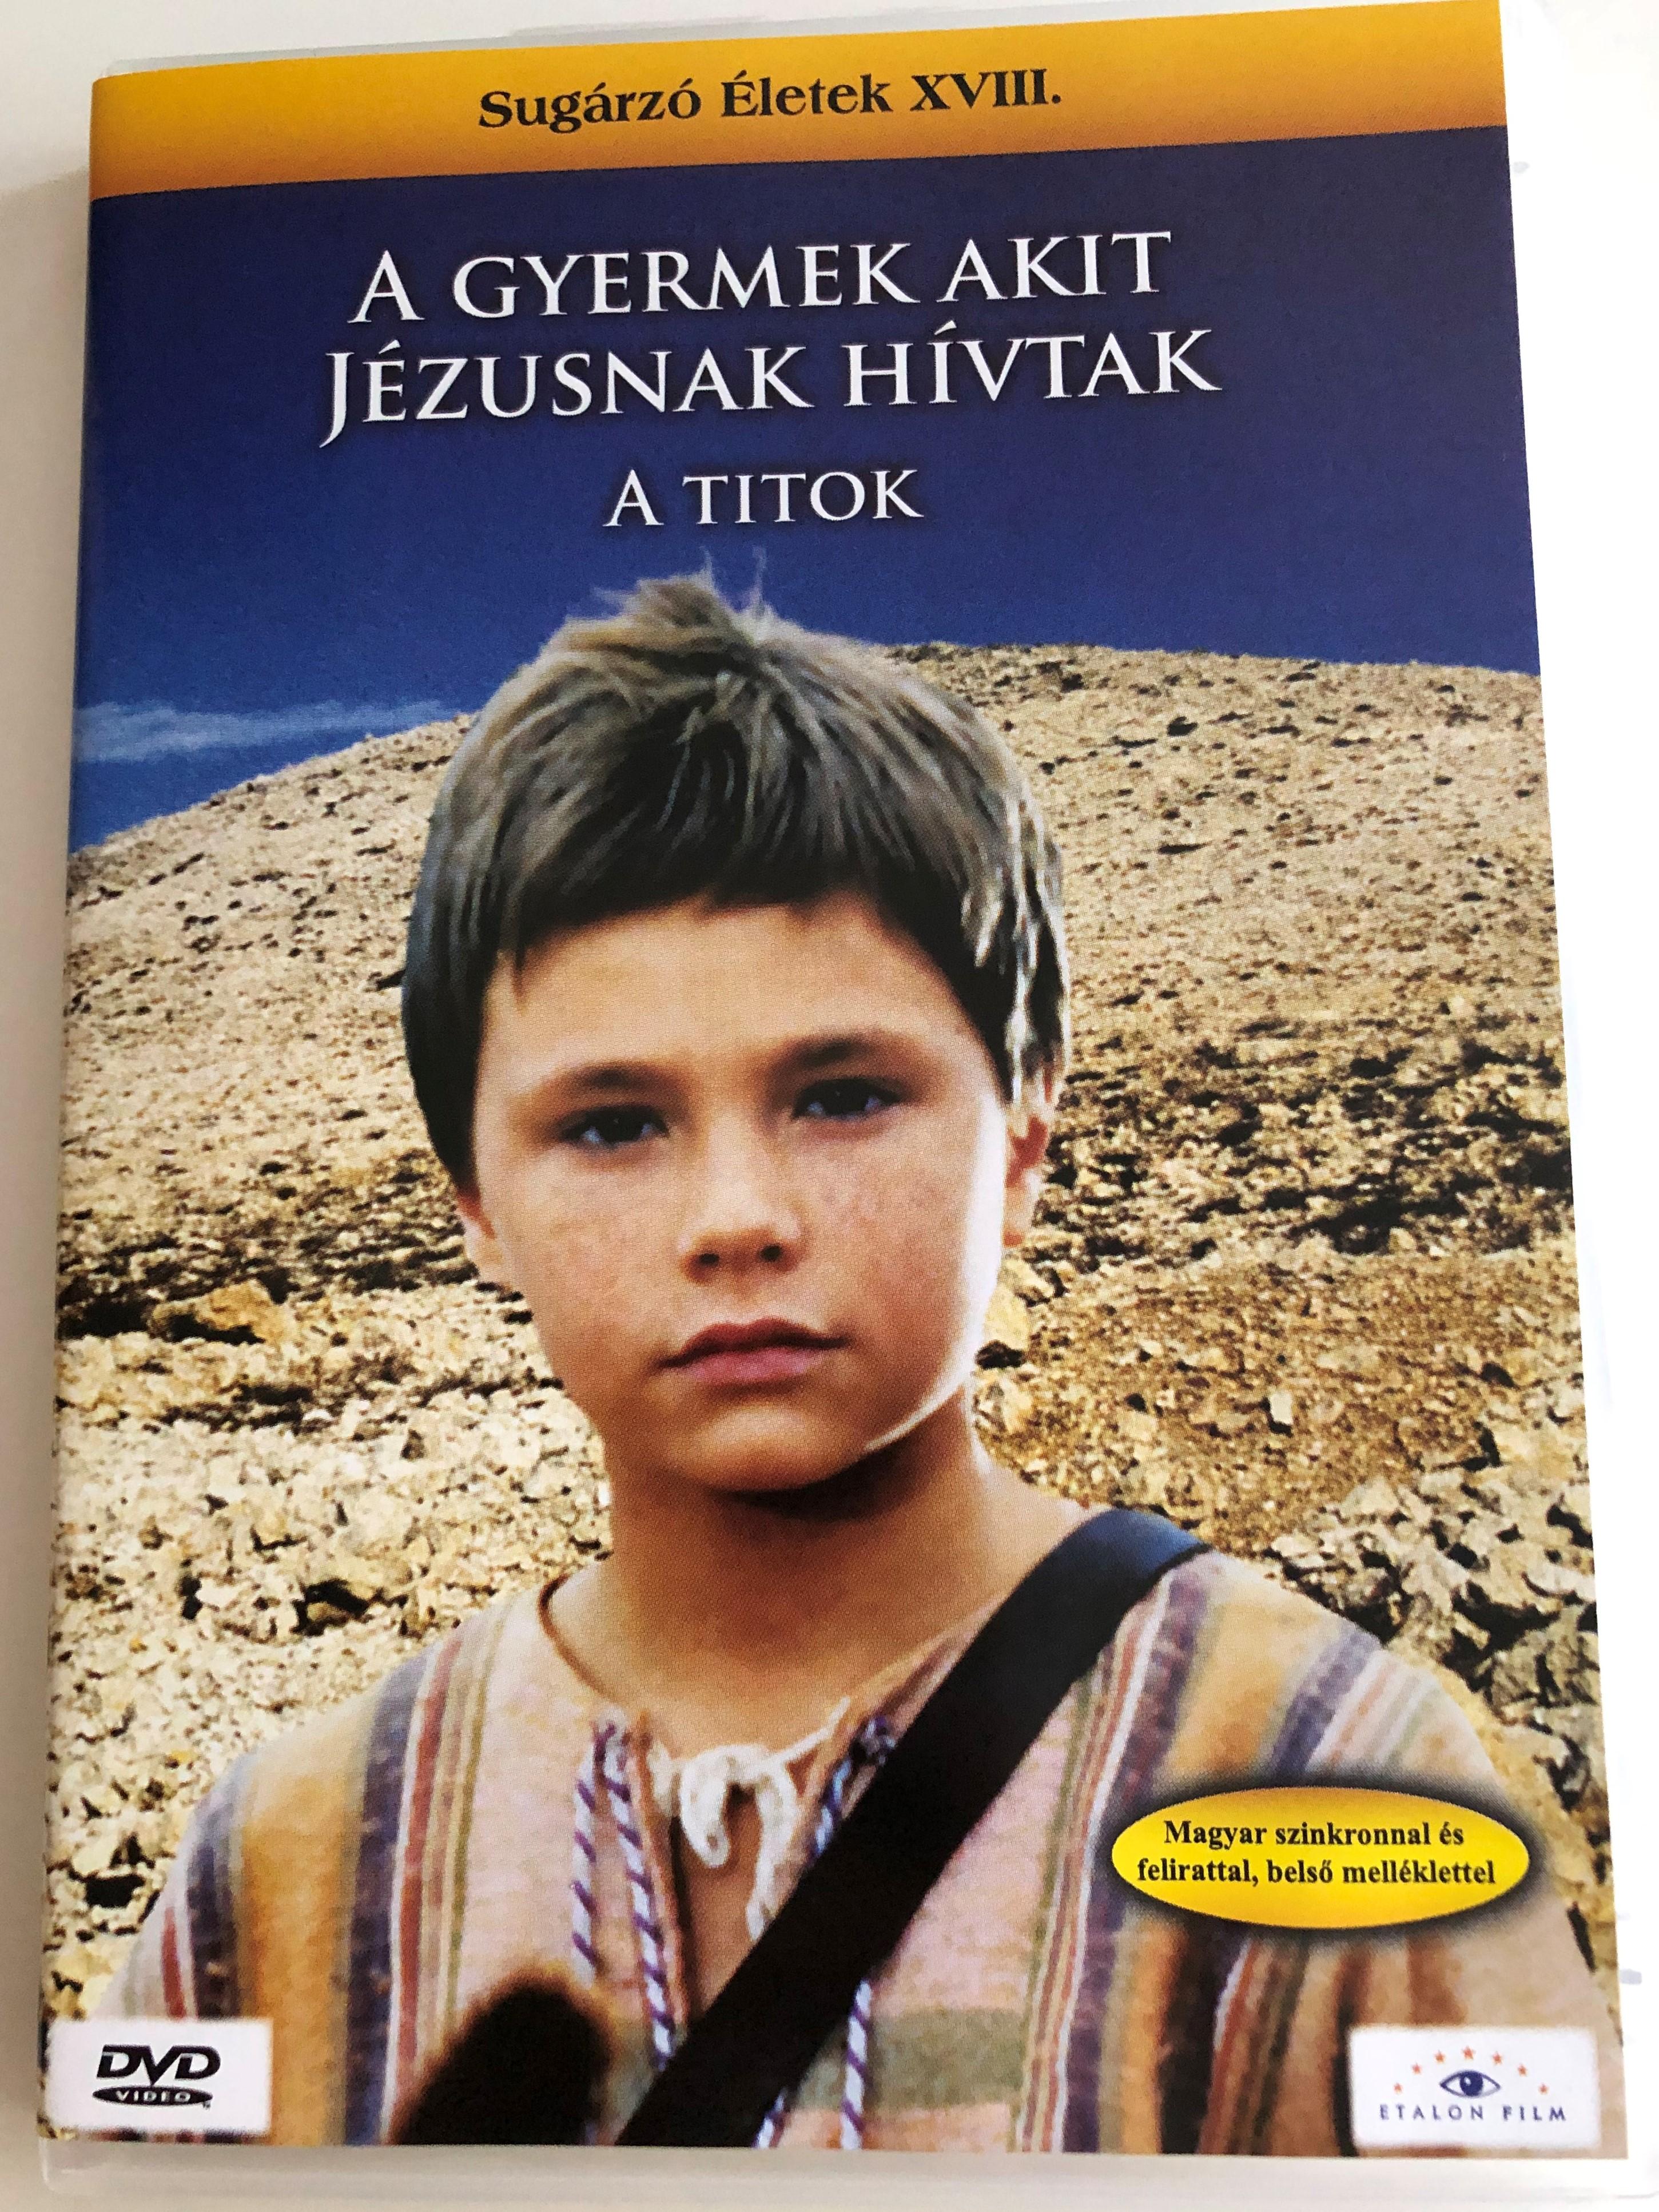 -un-bambino-di-nome-gesu-il-mistero-dvd-1988-a-gyermek-akit-j-zusnak-h-vtak-a-titok-directed-by-franco-rossi-starring-matteo-bellina-alessandro-gassman-irene-papas-1-.jpg